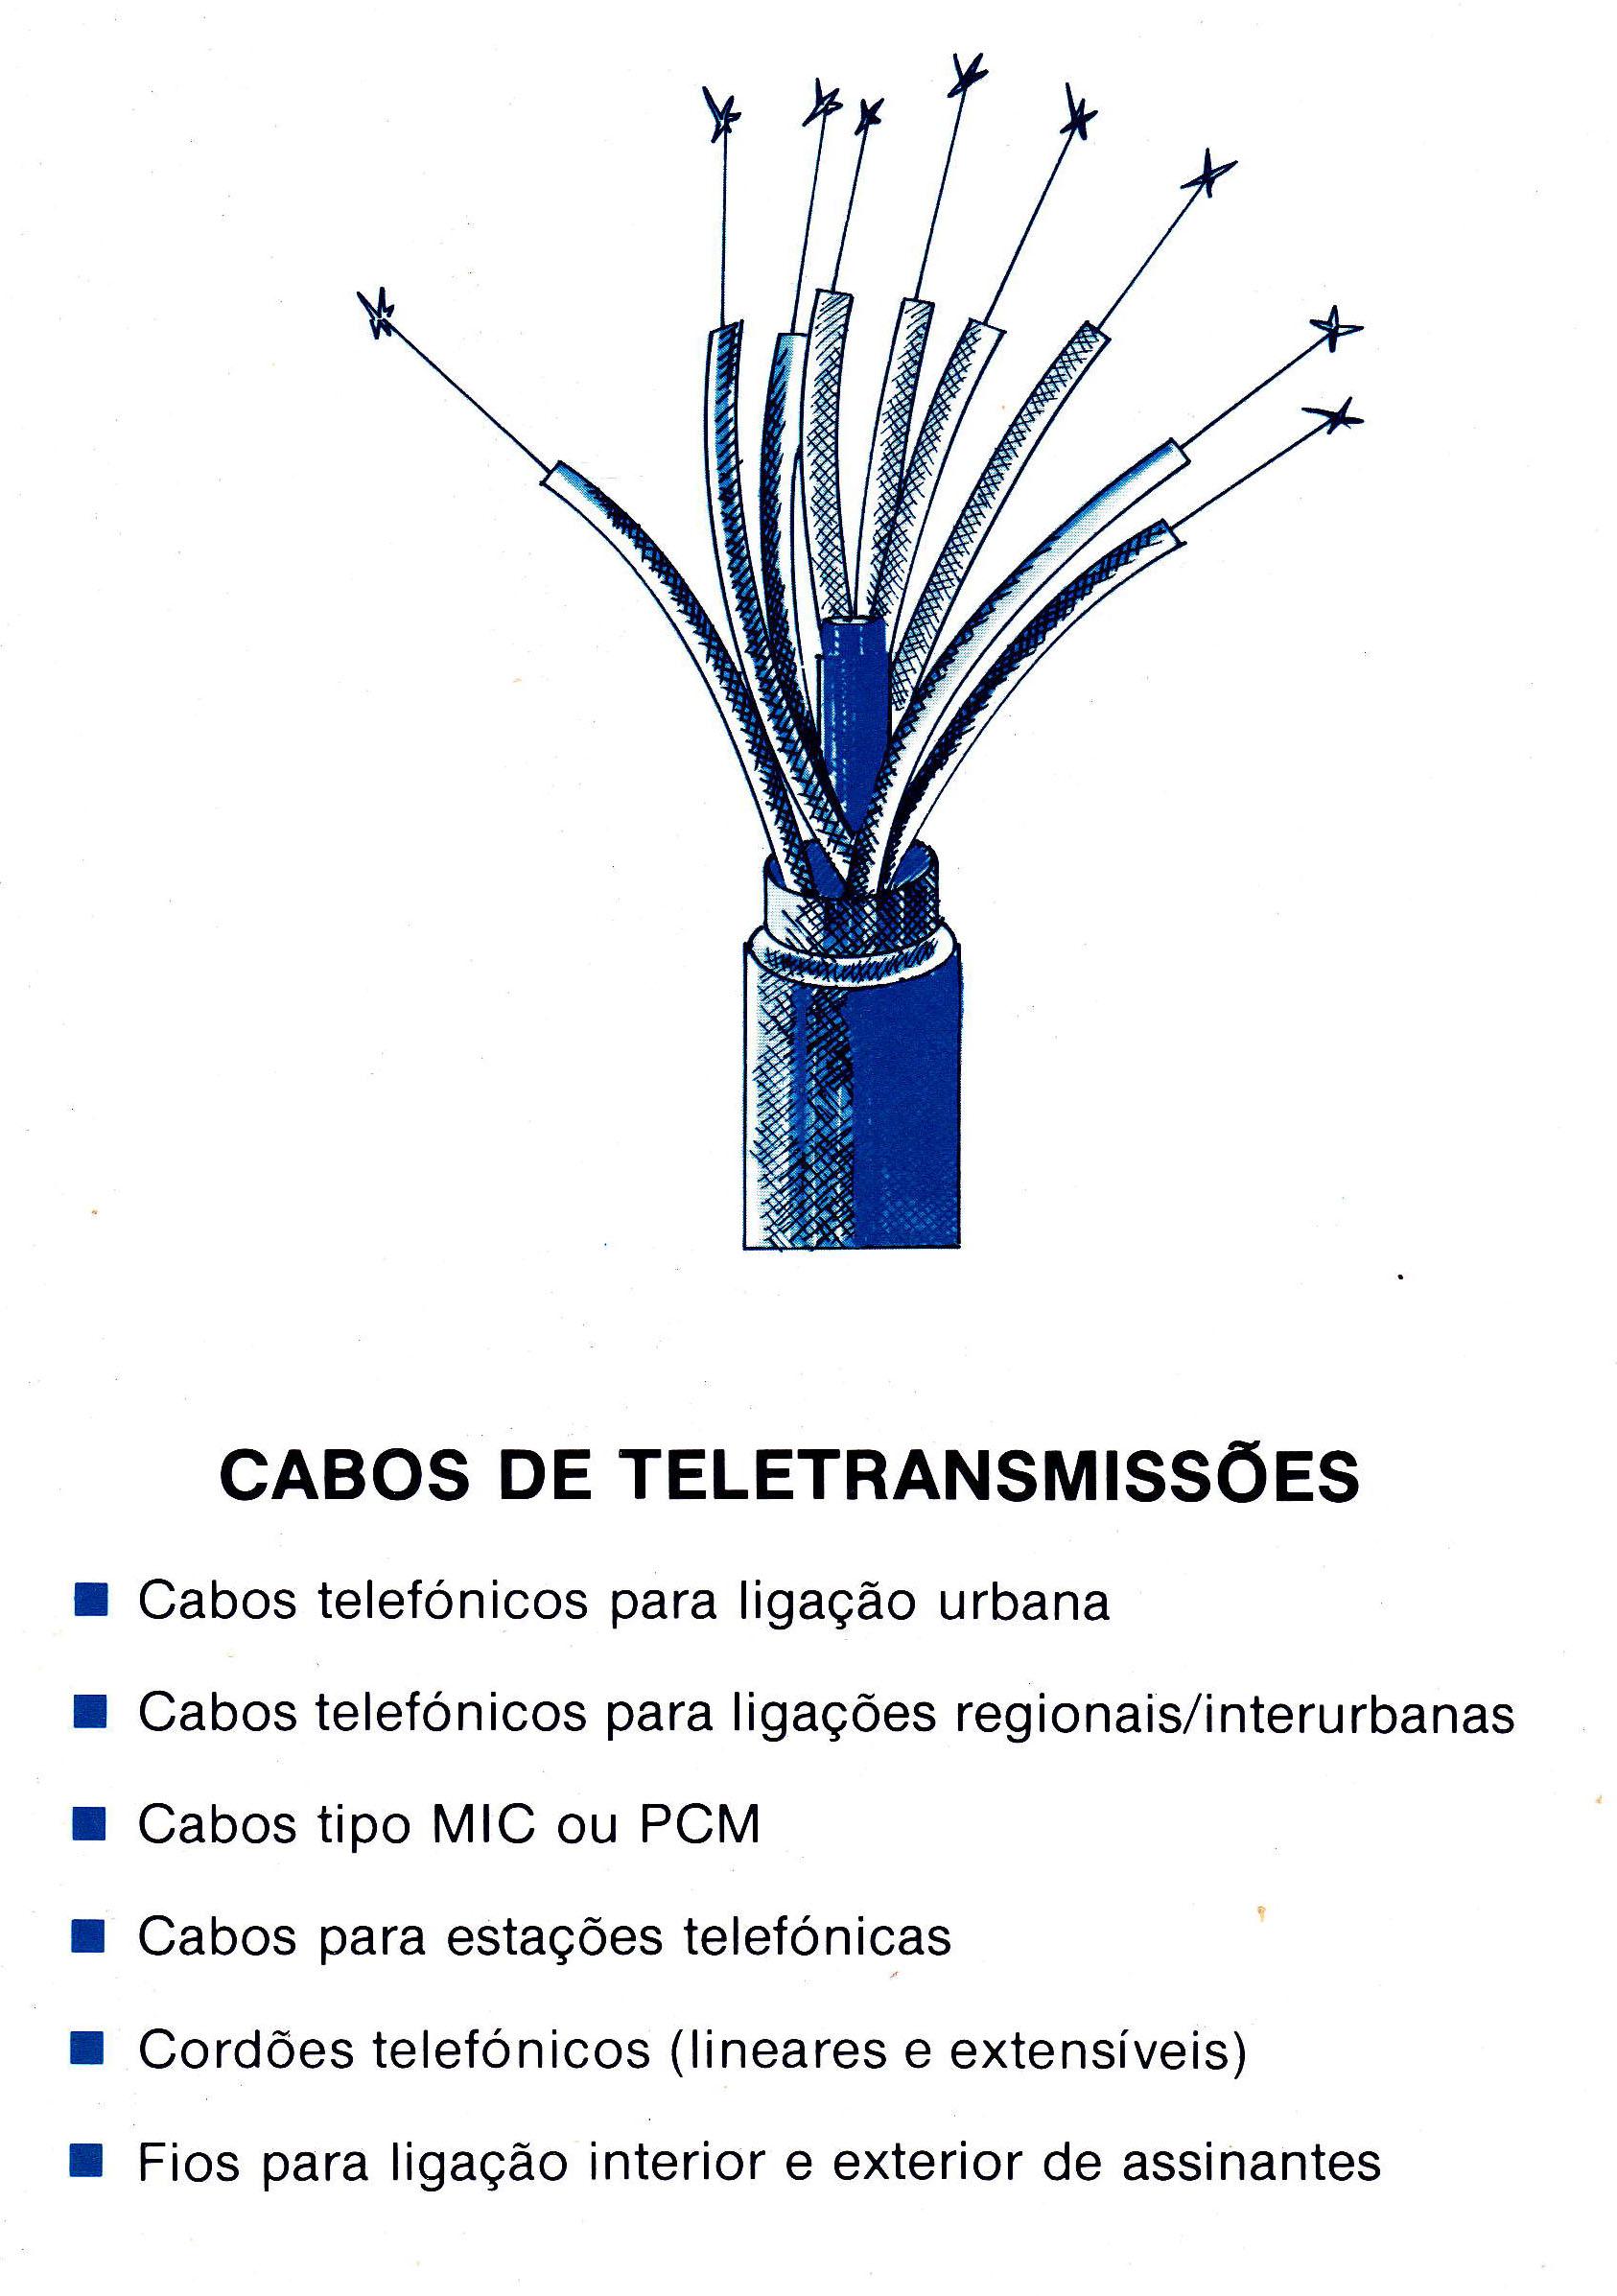 CABOS DE TELETRANMISSÕES